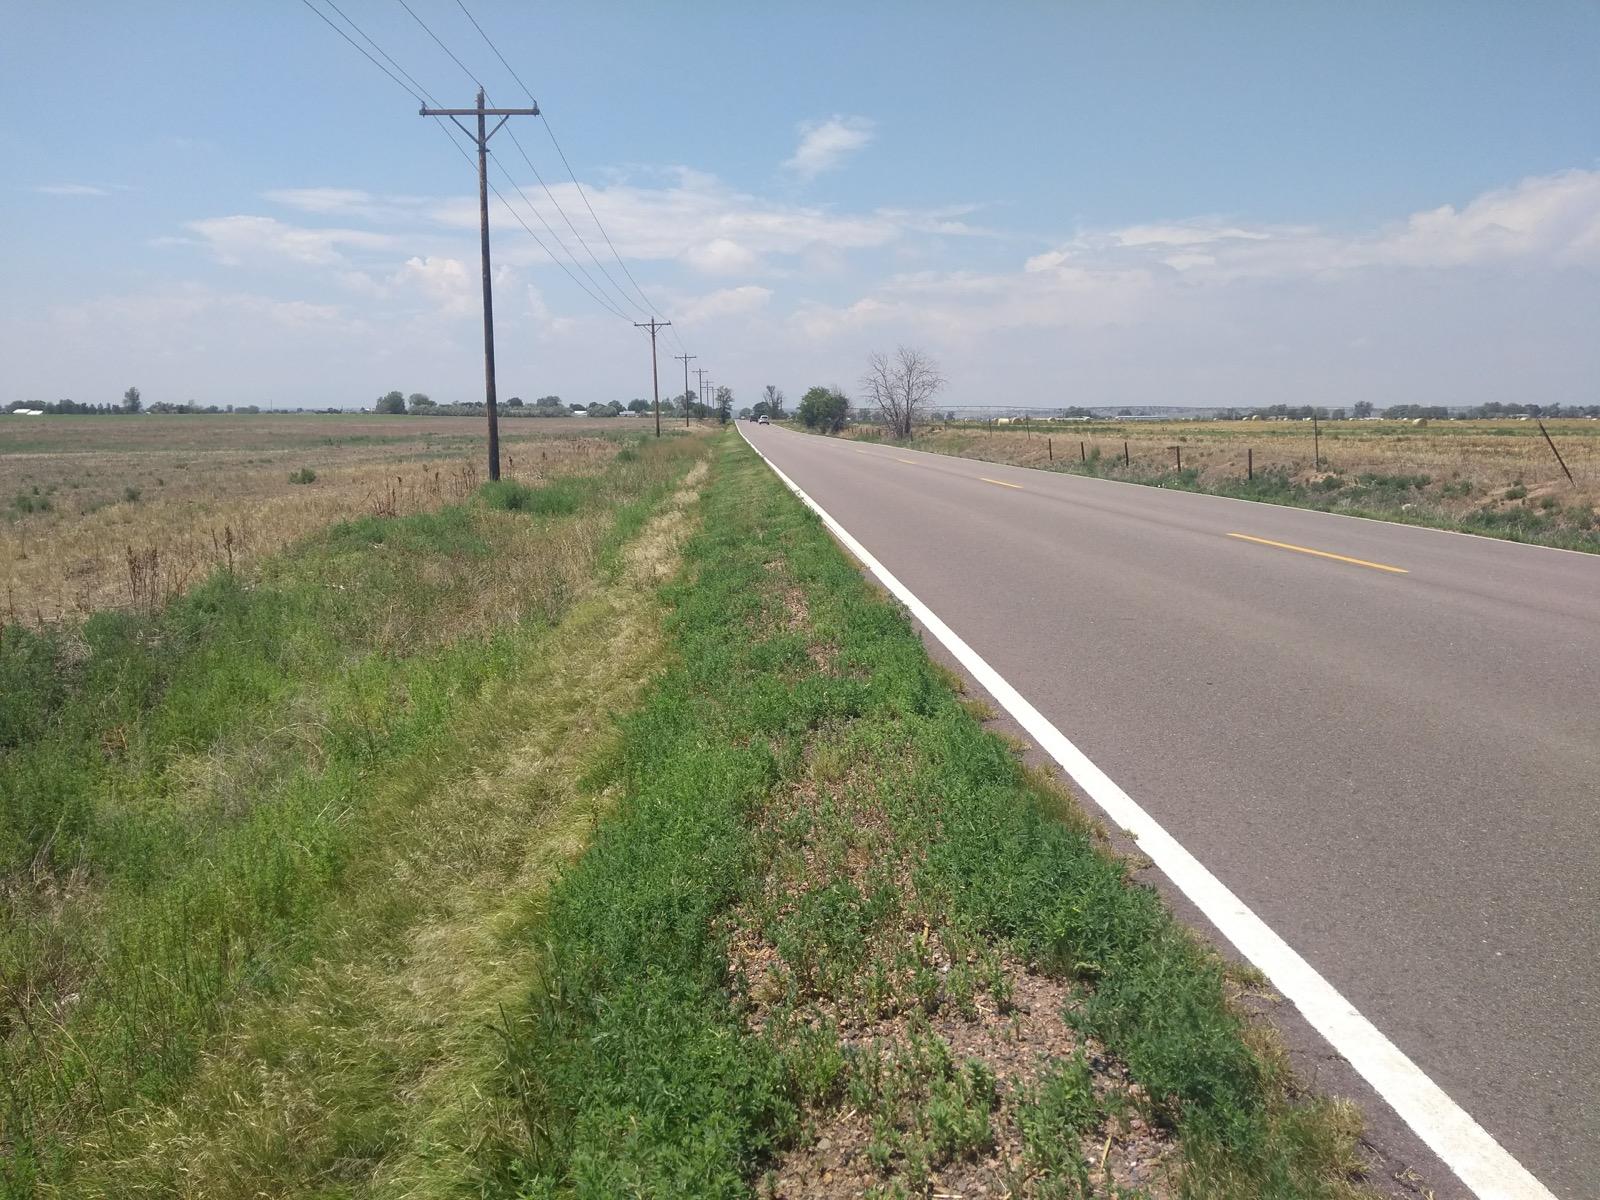 Long flat road, small verge